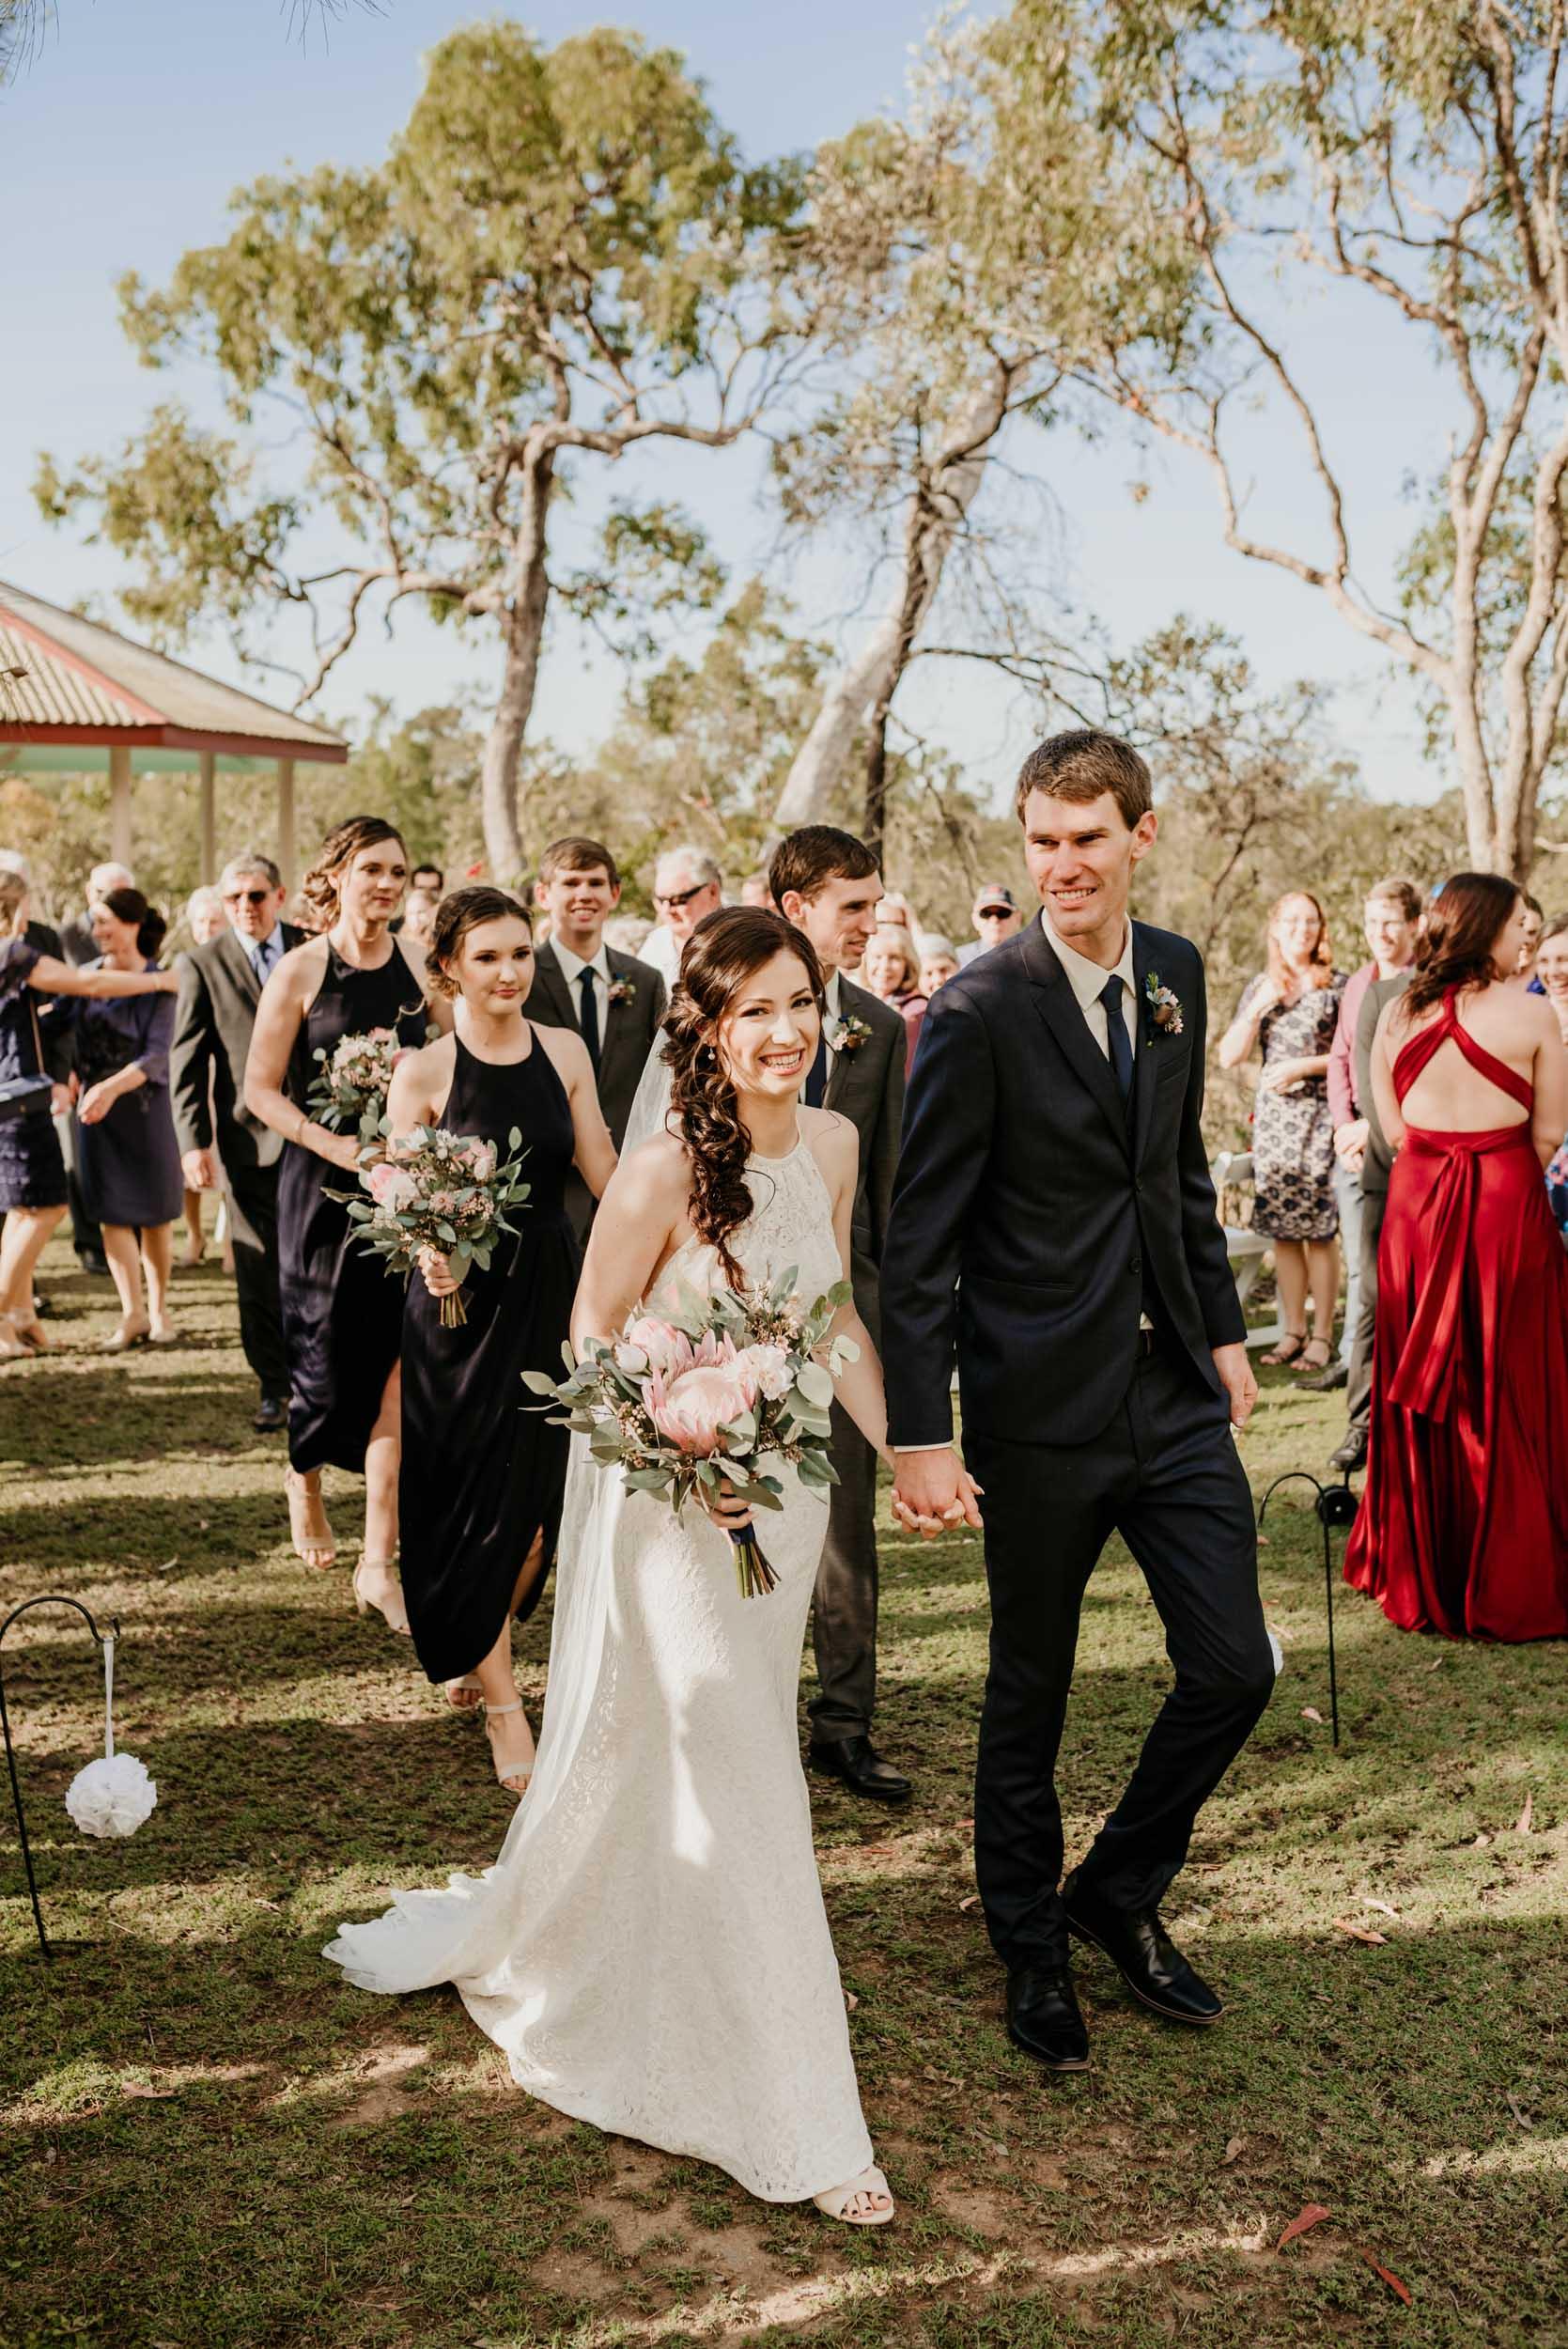 The Raw Photographer - Cairns Wedding Photographer - Atherton Tablelands Venue - Mareeba Photography-36.jpg